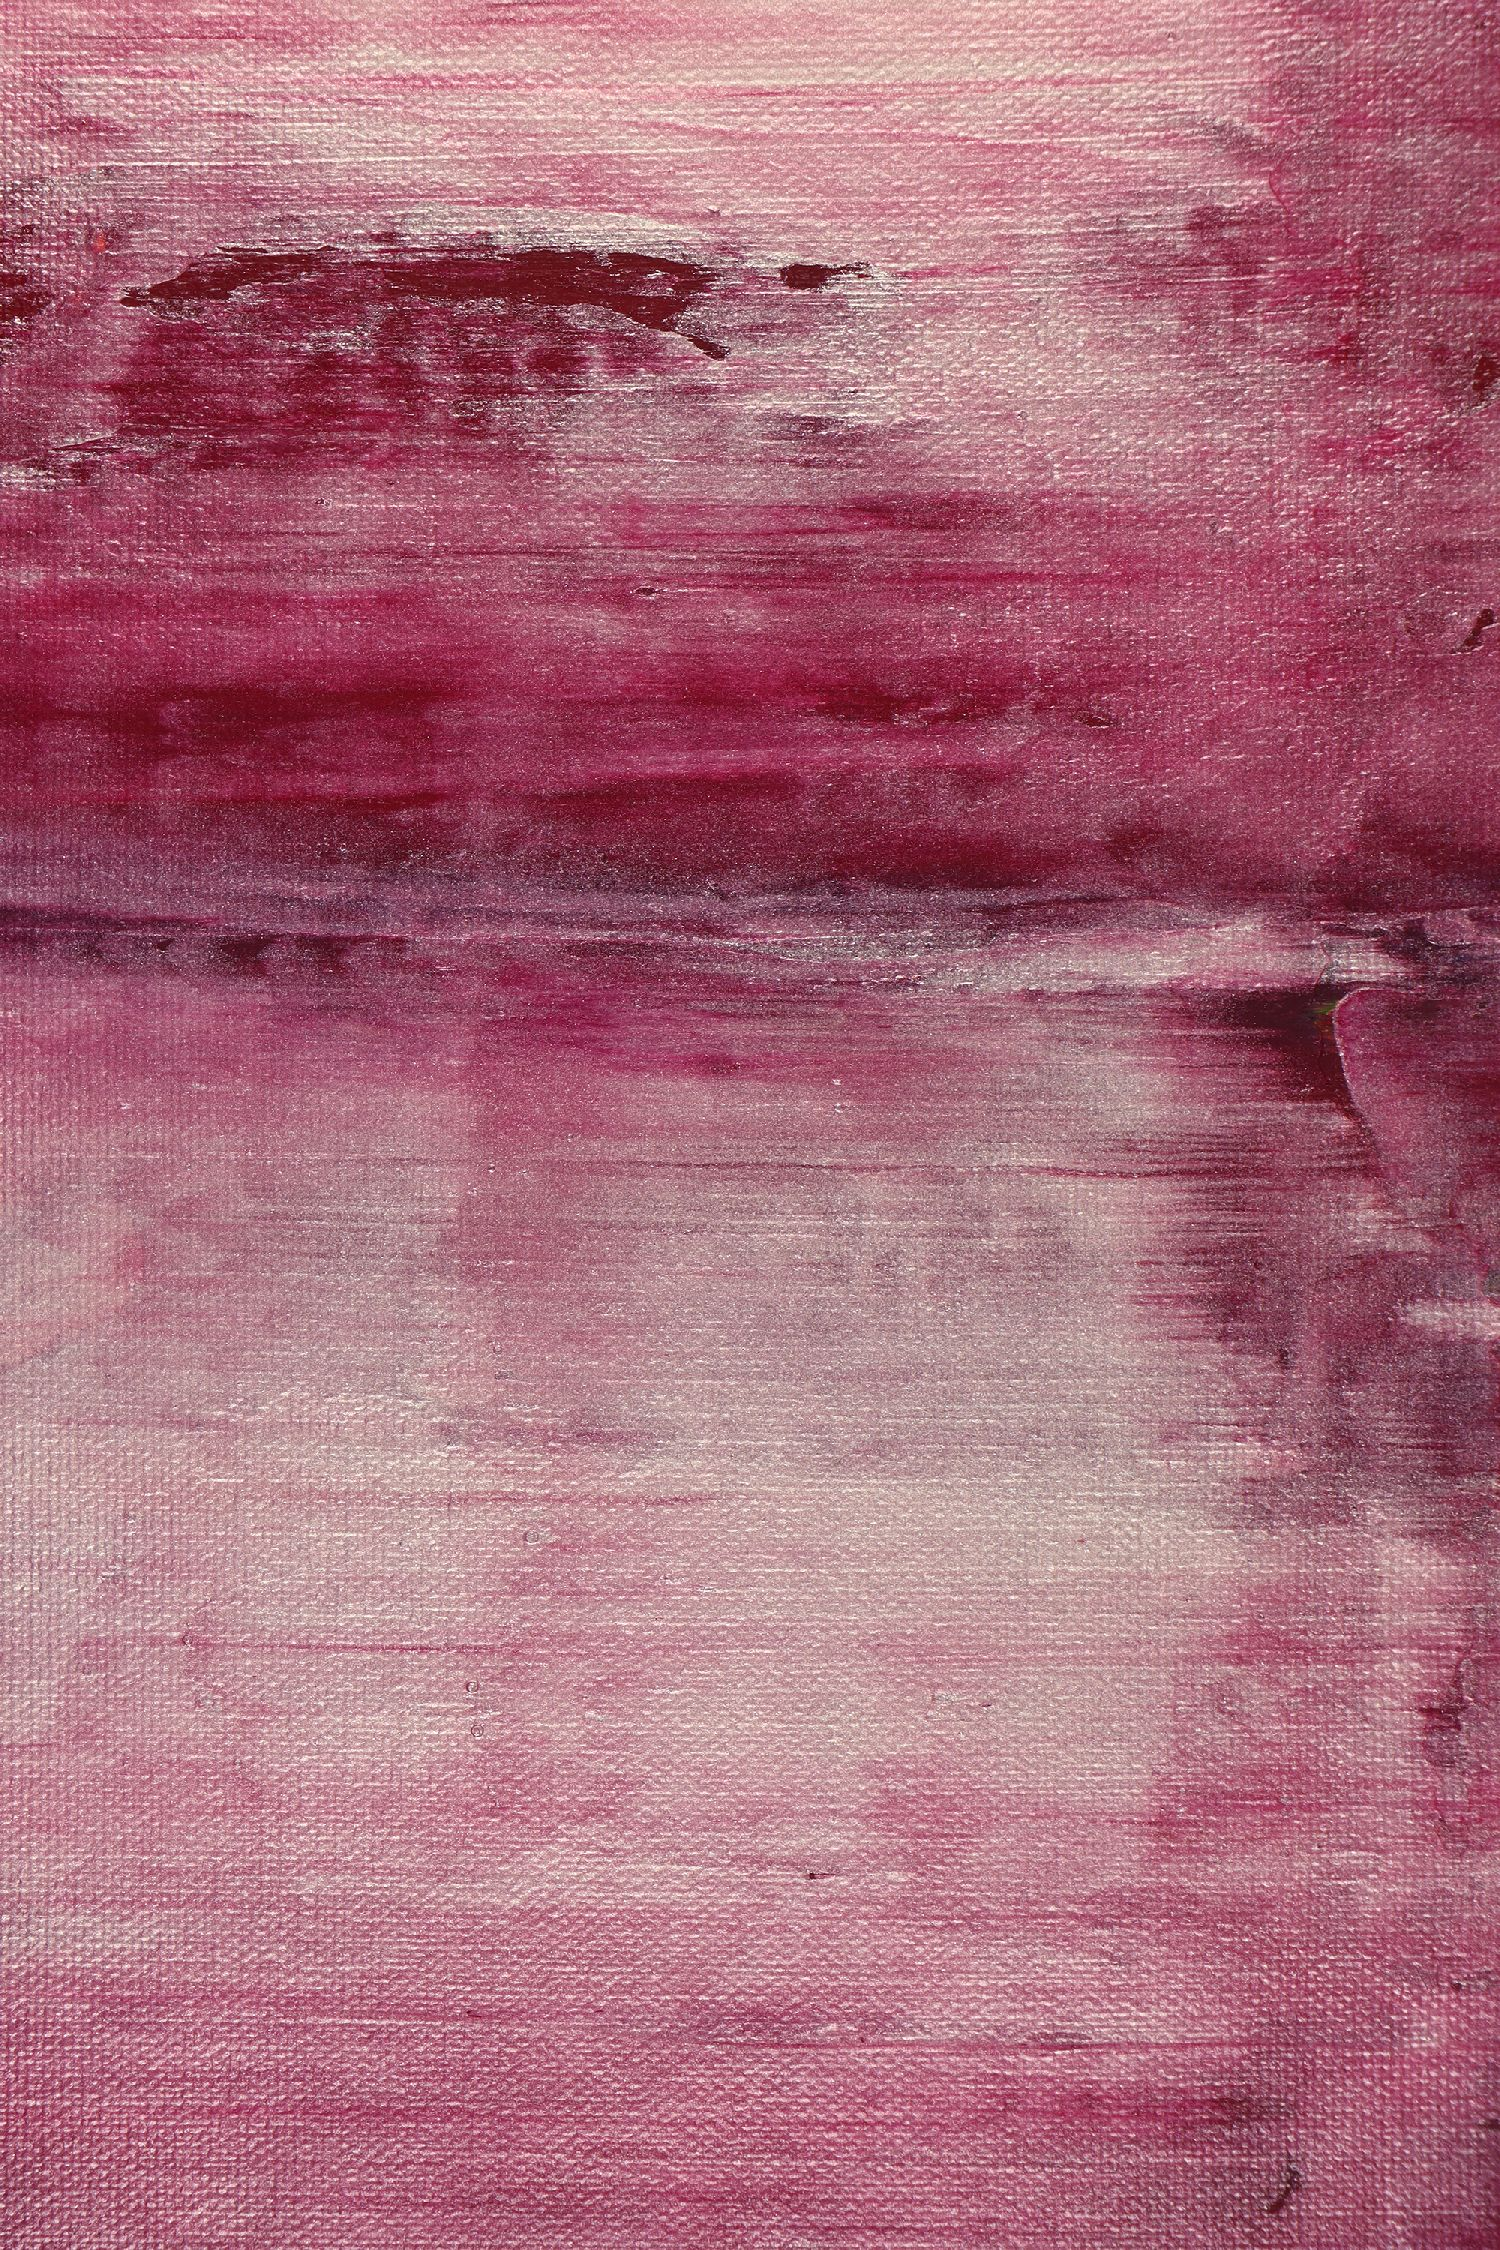 Detail - Venus Terrain (2020) by Nestor Toro in L.A.